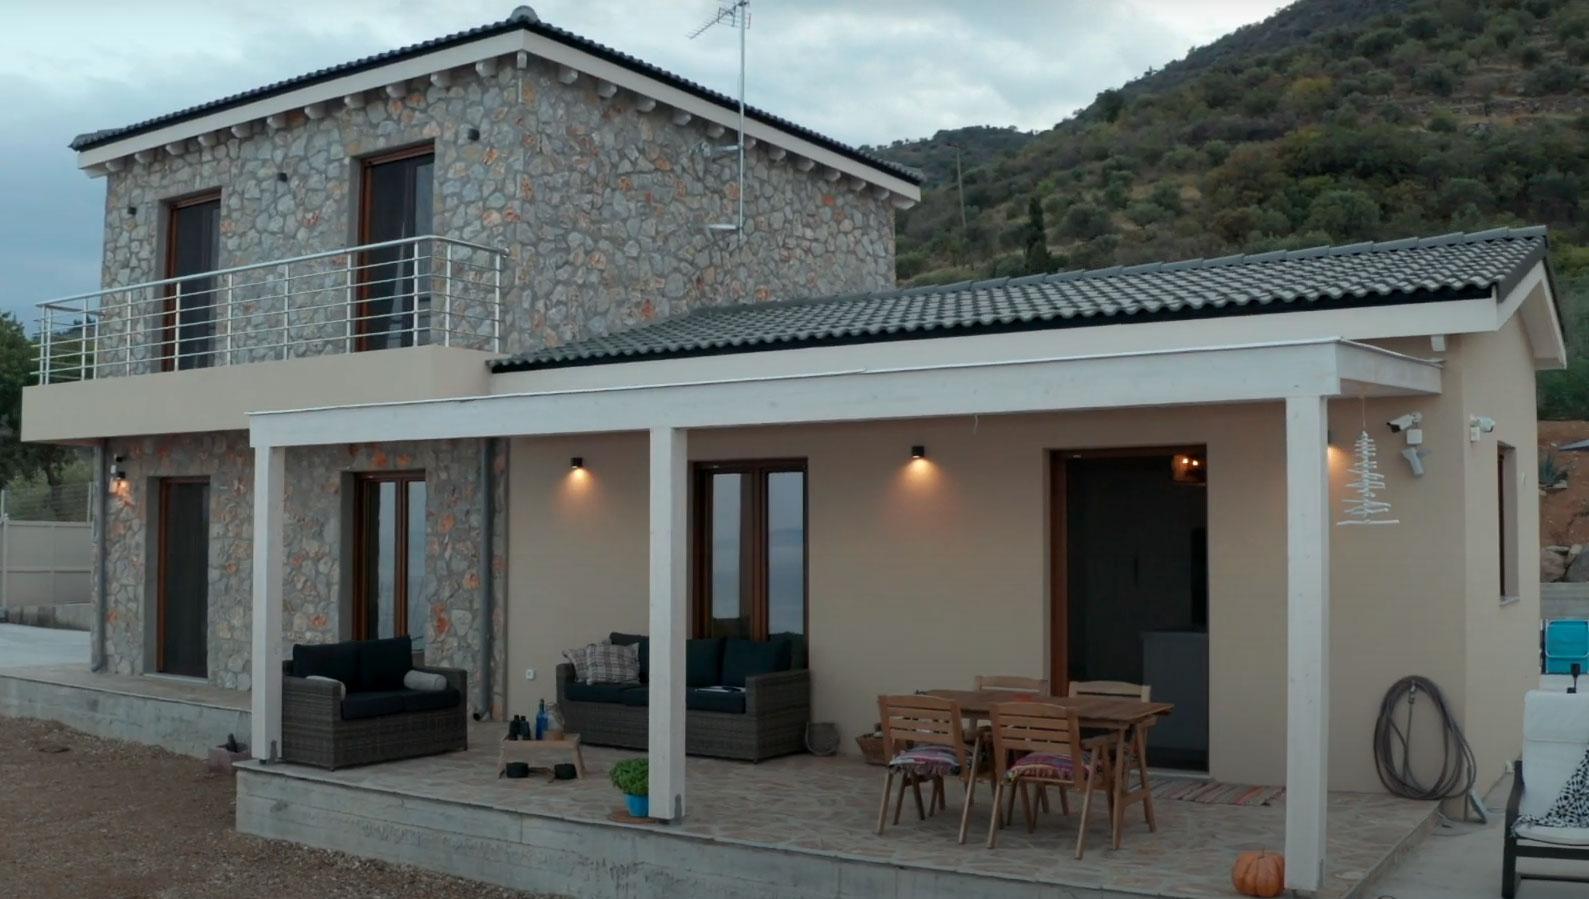 Prefabricated house of Kofinas S A at Tyros